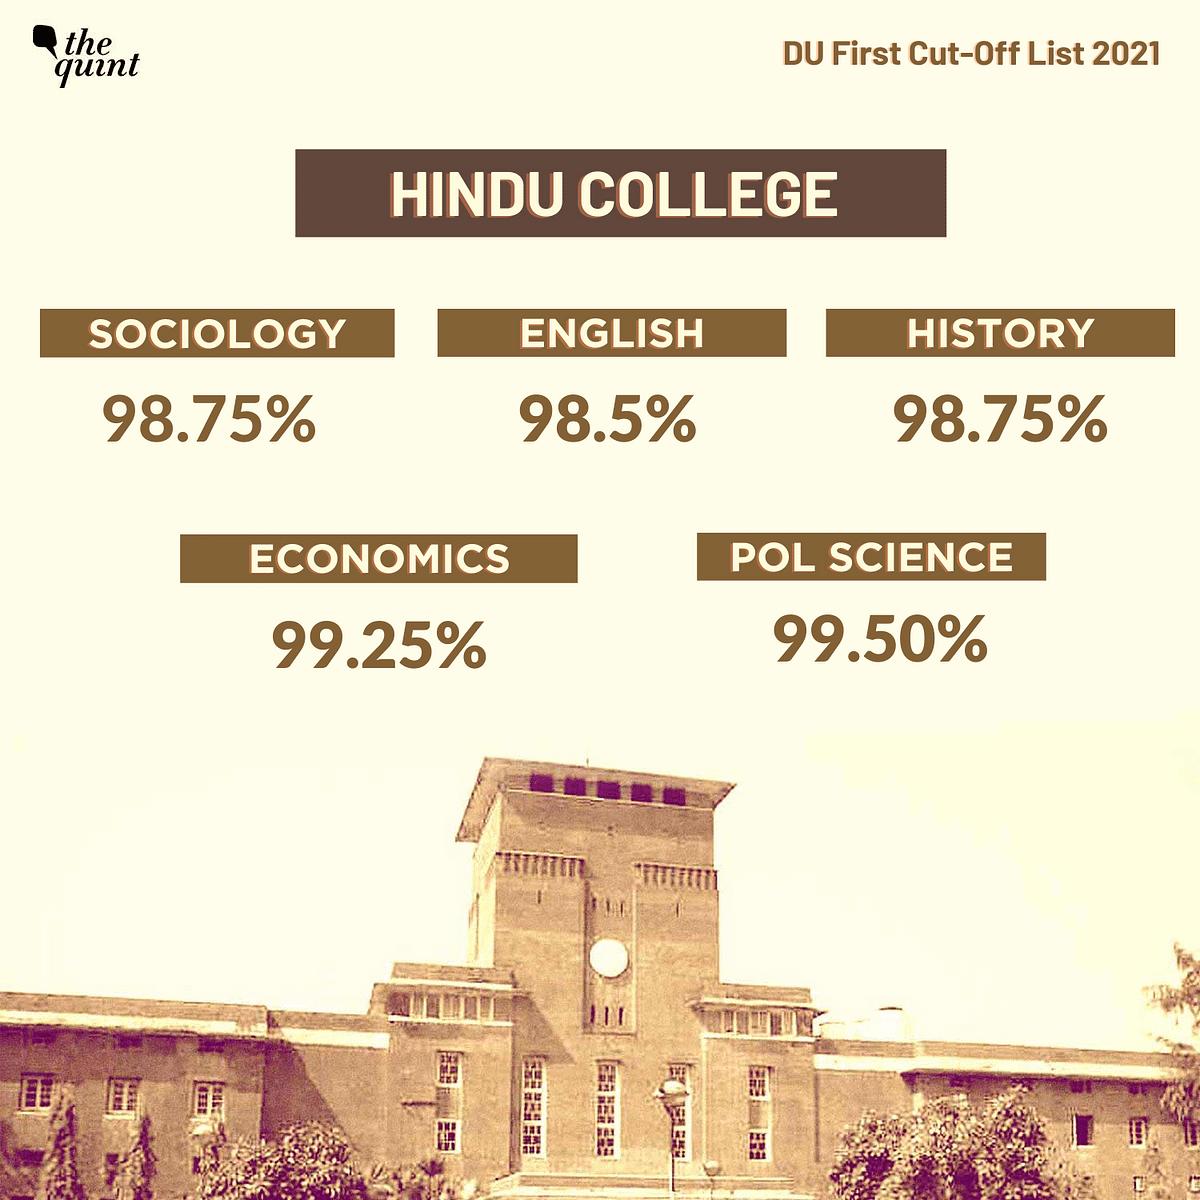 "<div class=""paragraphs""><p>First cut-off list: Hindu College</p></div>"